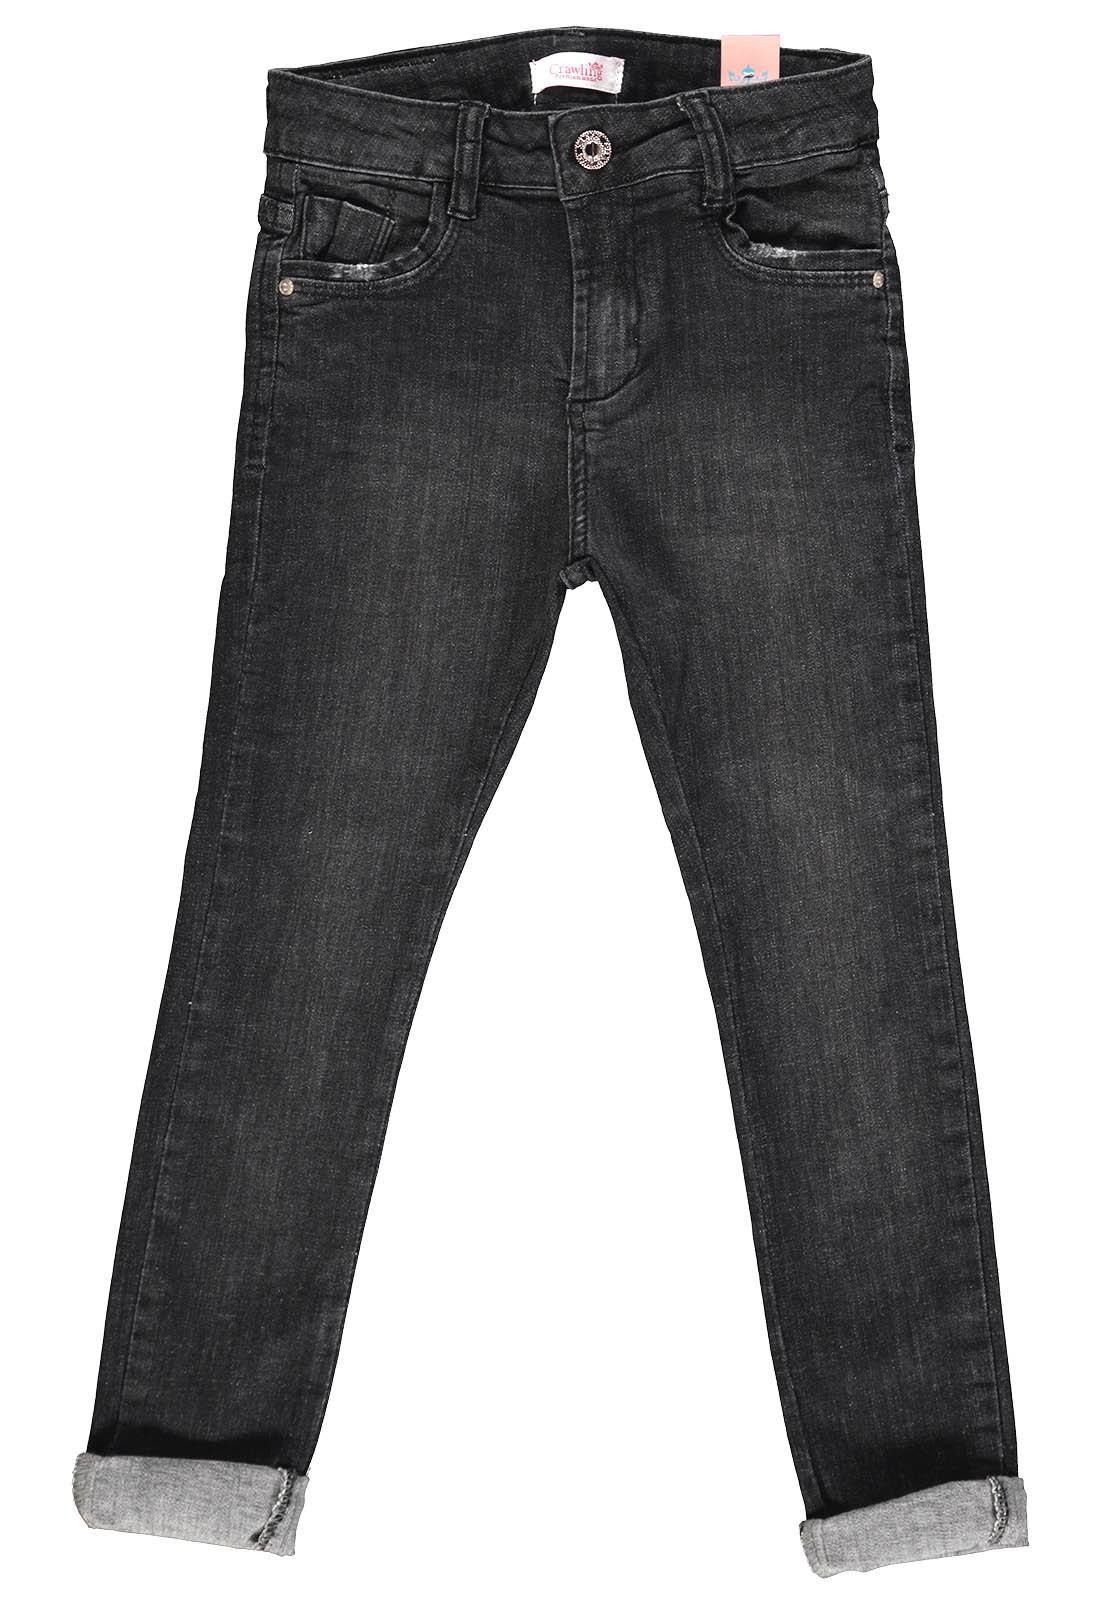 Calça Jeans Feminina Crawling Skinny Black